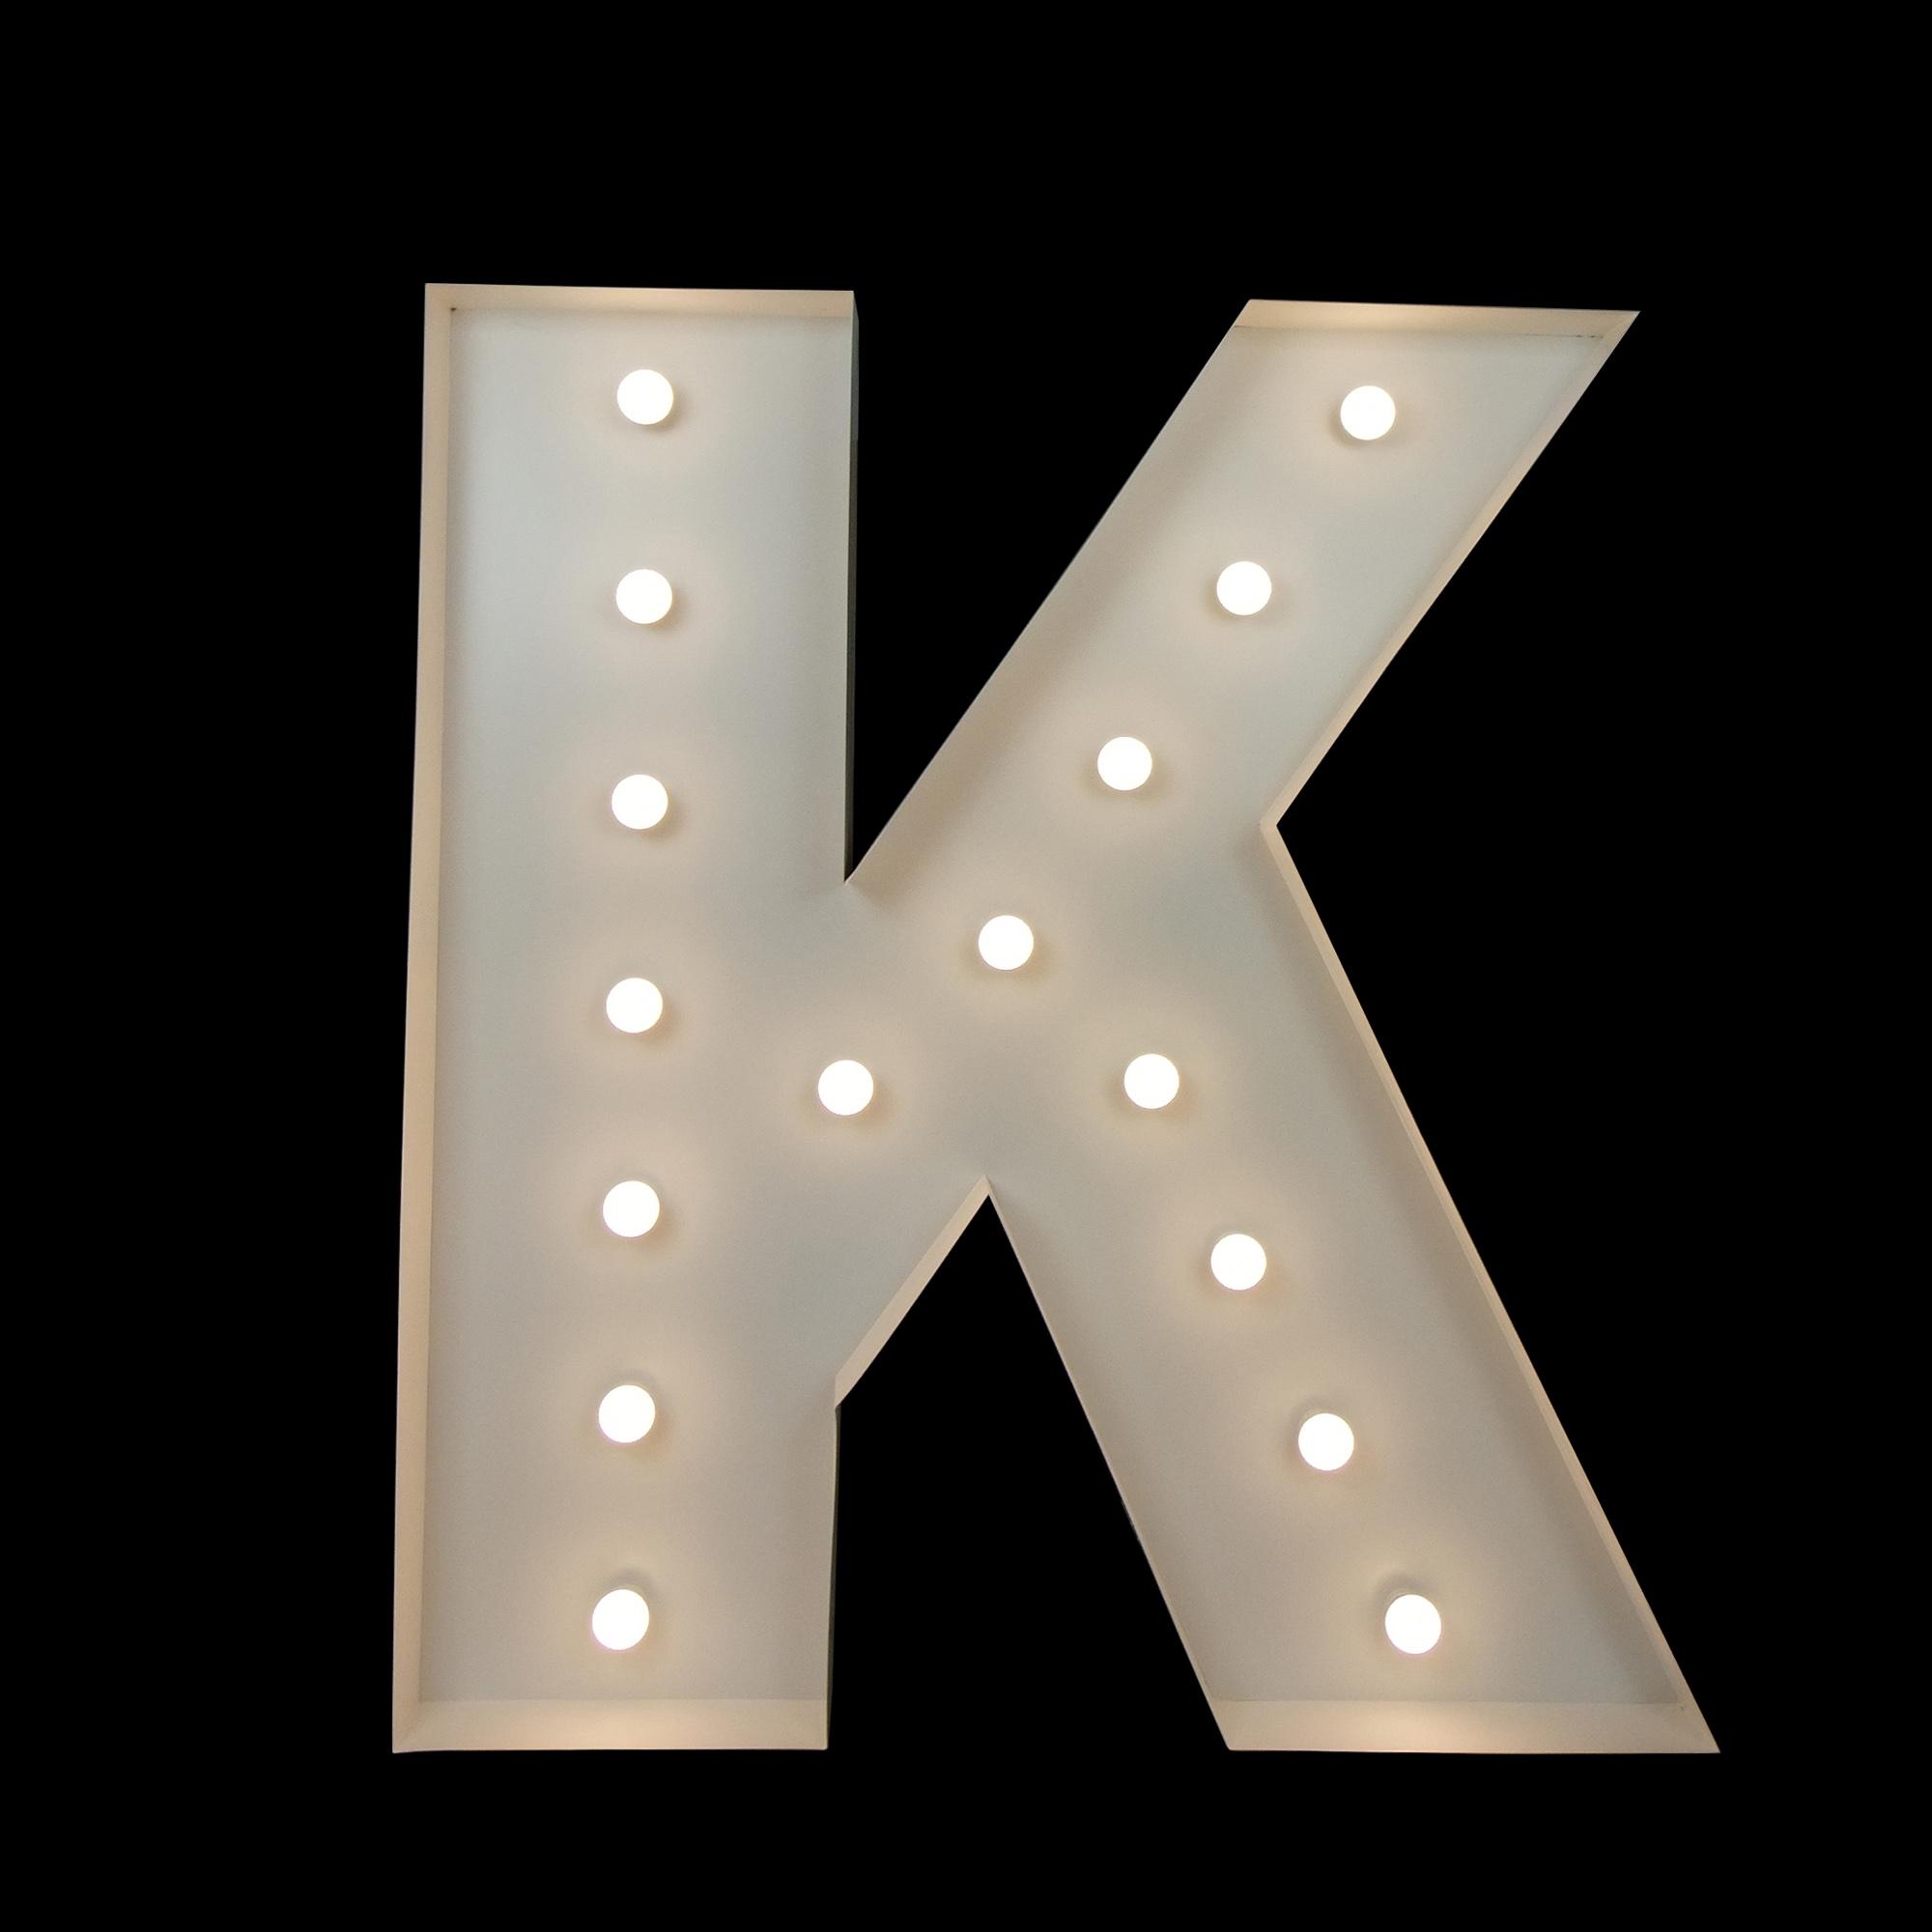 light up letter northern nsw - giant letter k